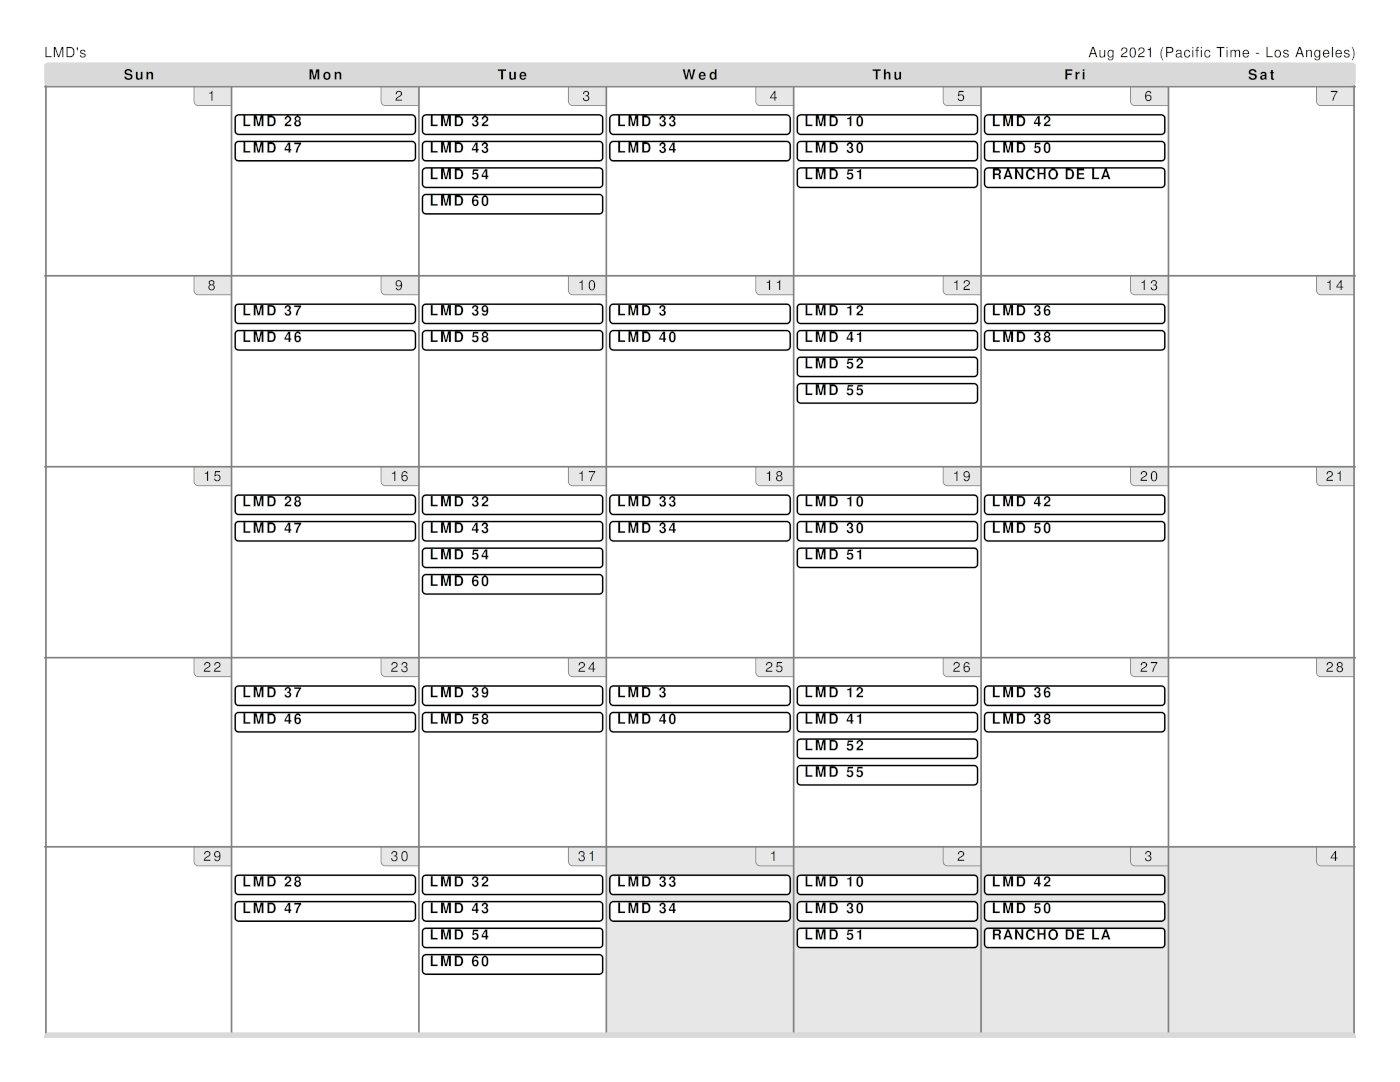 Garcia Schedule for August 2021